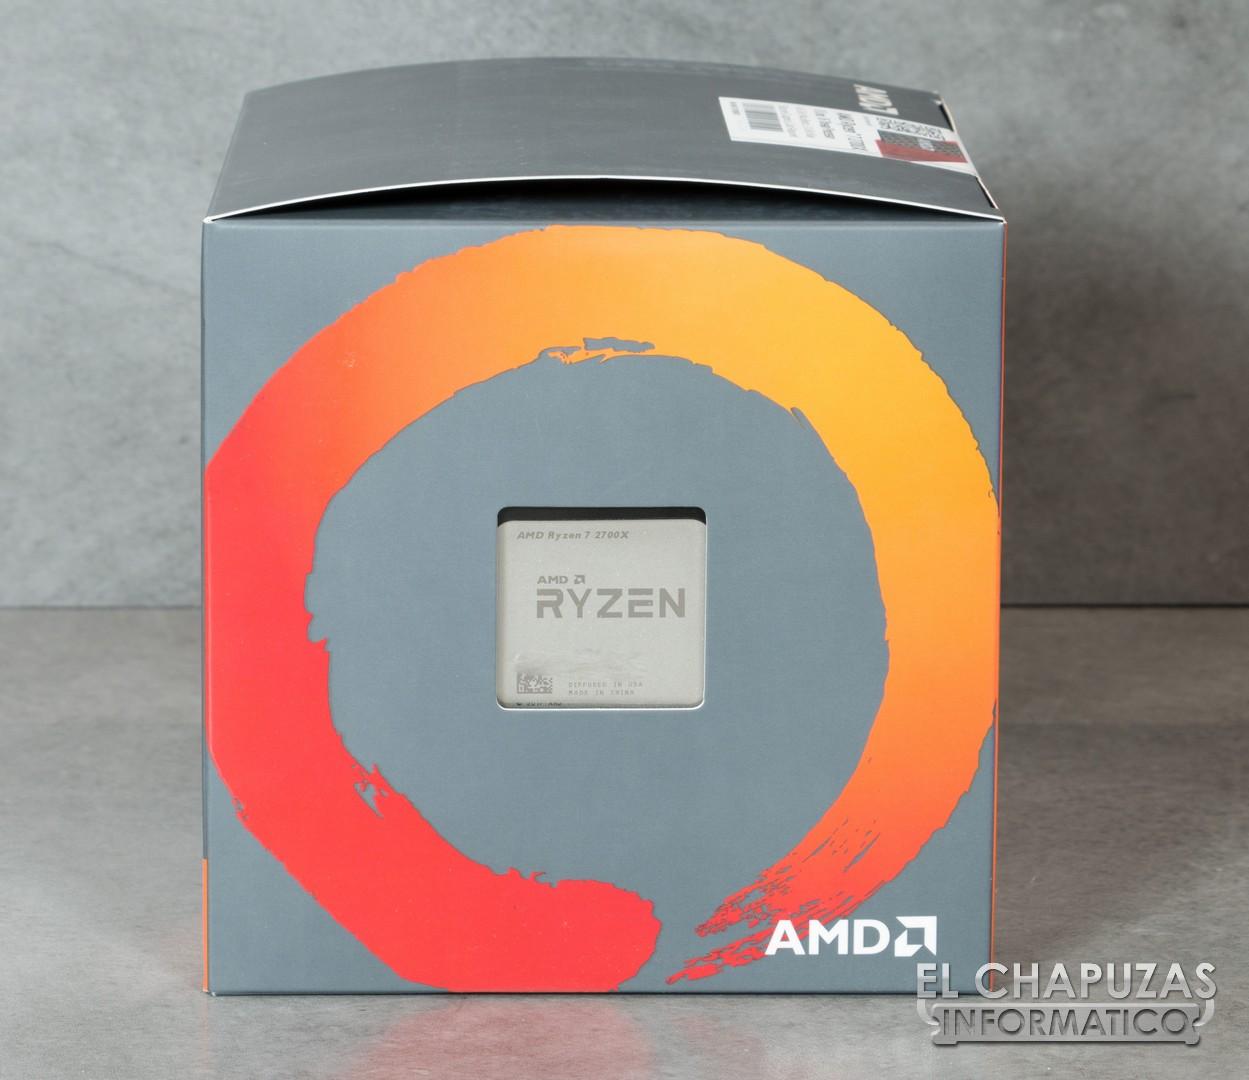 amd-ryzen-7-2700x-02